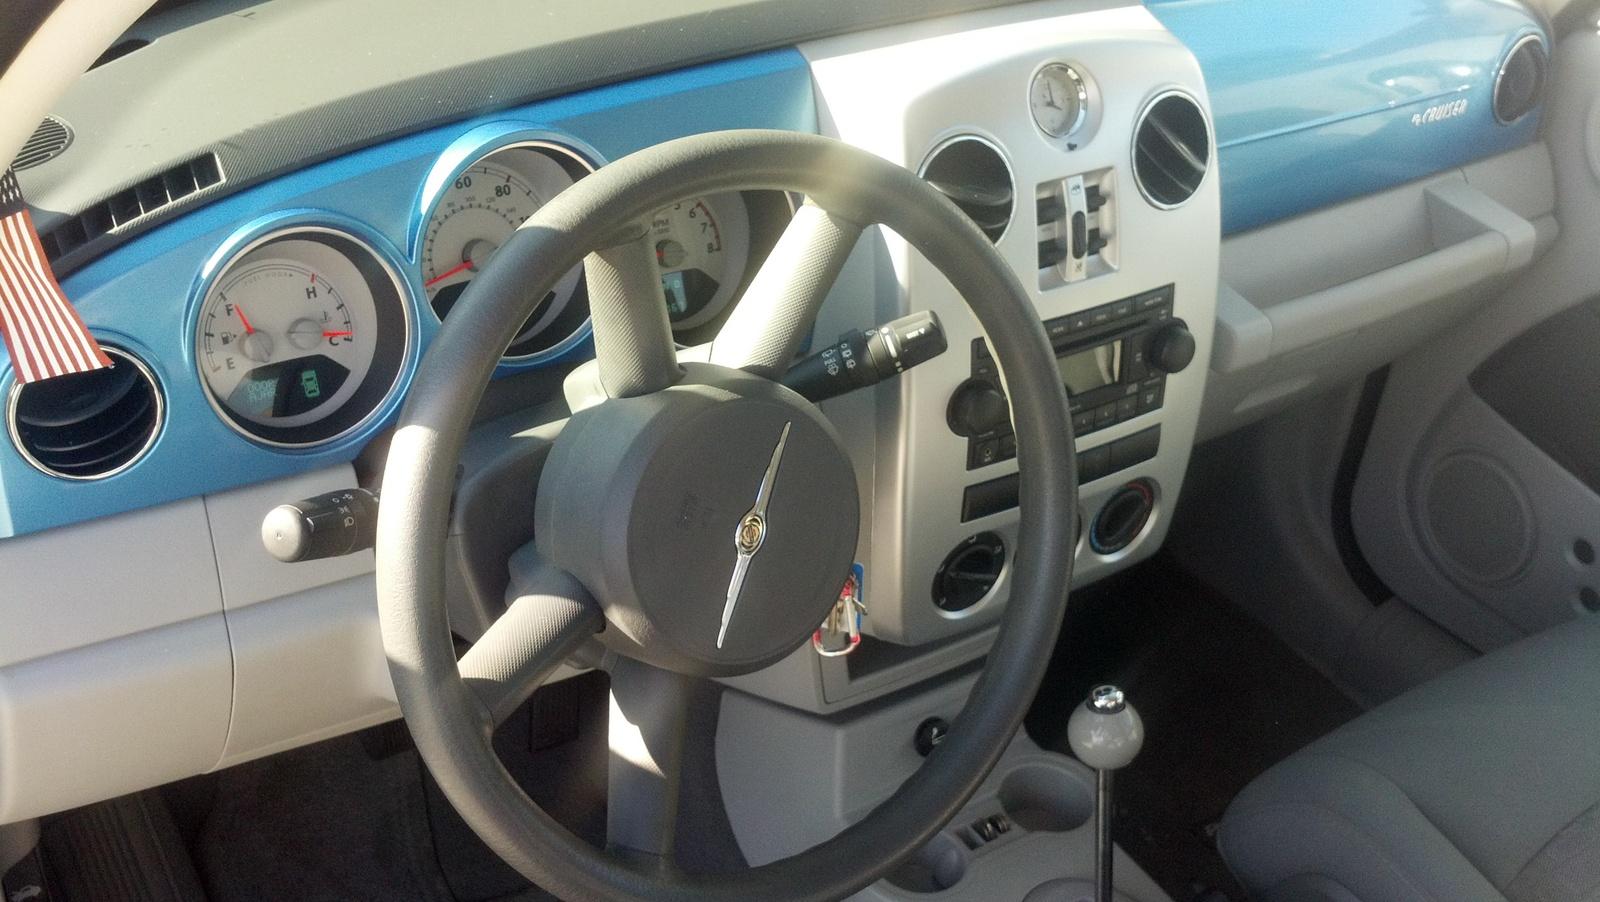 2008 chrysler pt cruiser interior pictures cargurus. Black Bedroom Furniture Sets. Home Design Ideas